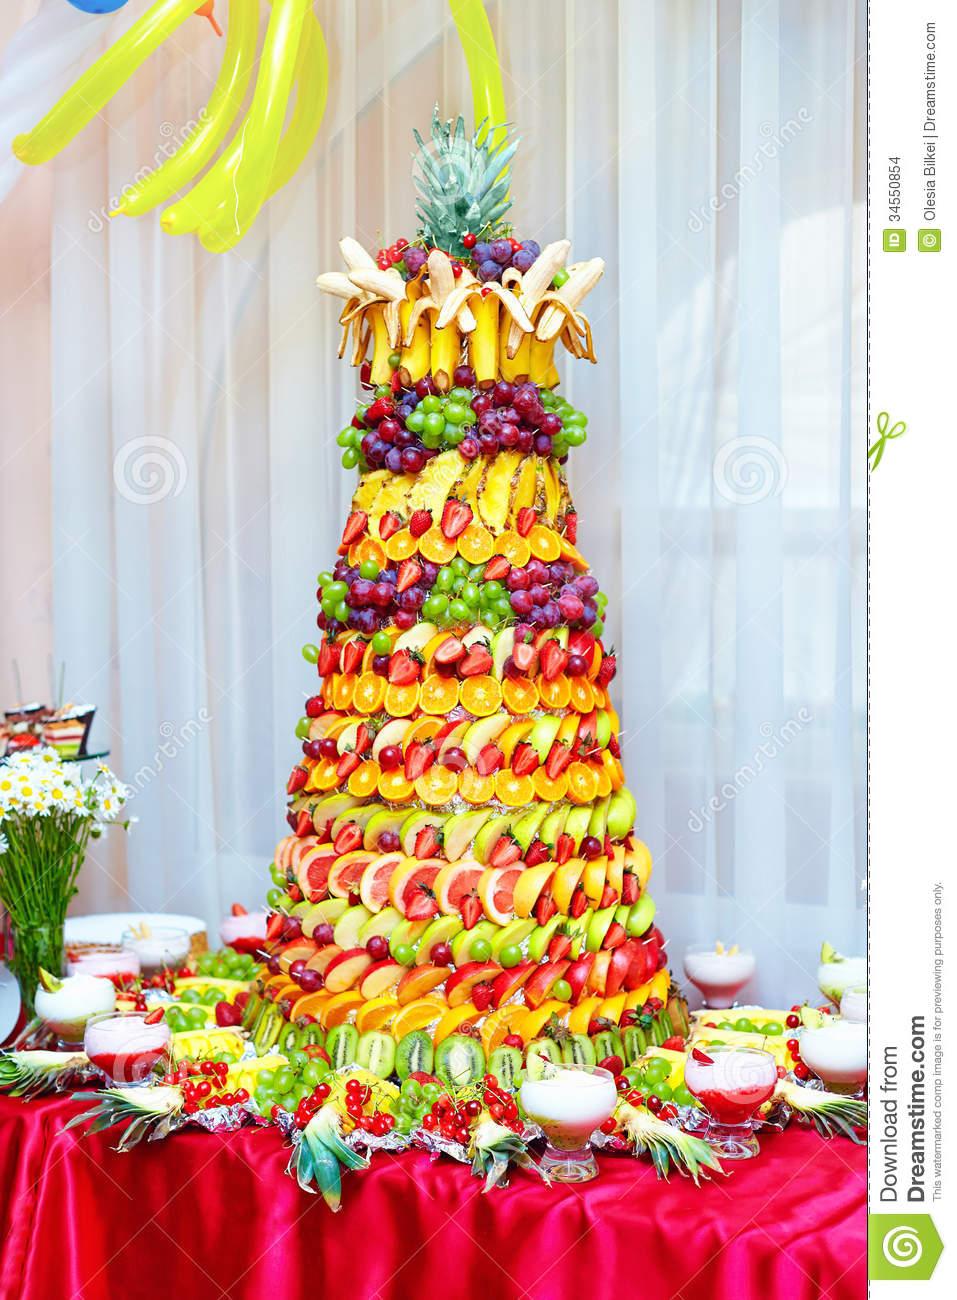 Use Fruits as a Cake Decoration